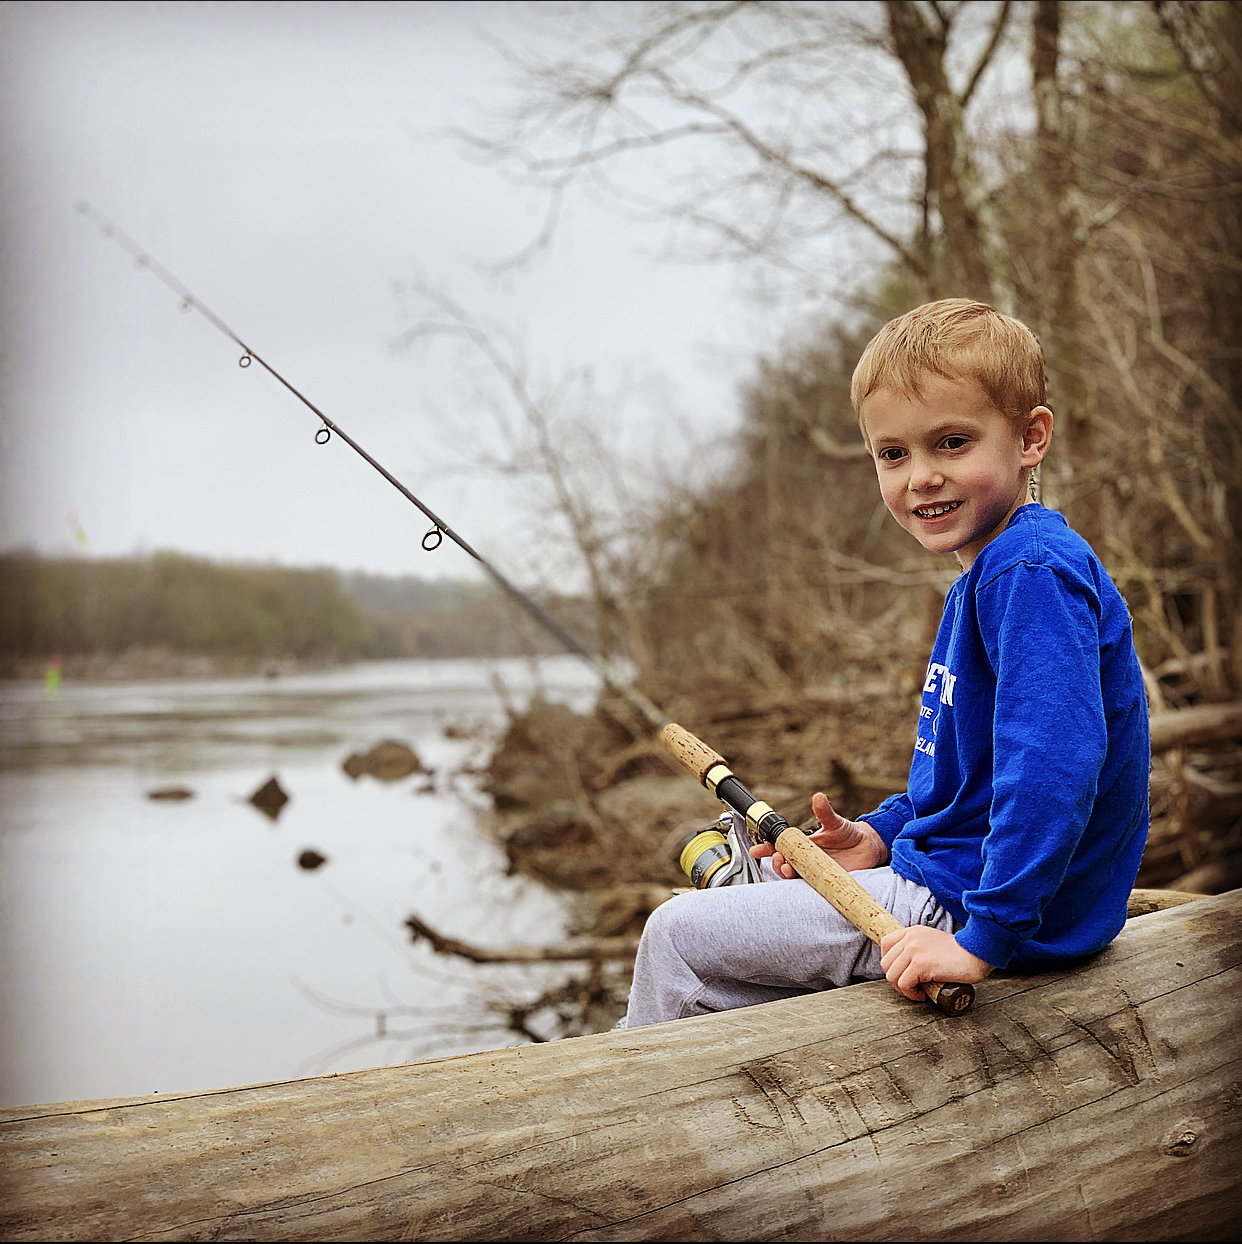 Jack - Fishing along the Potomac